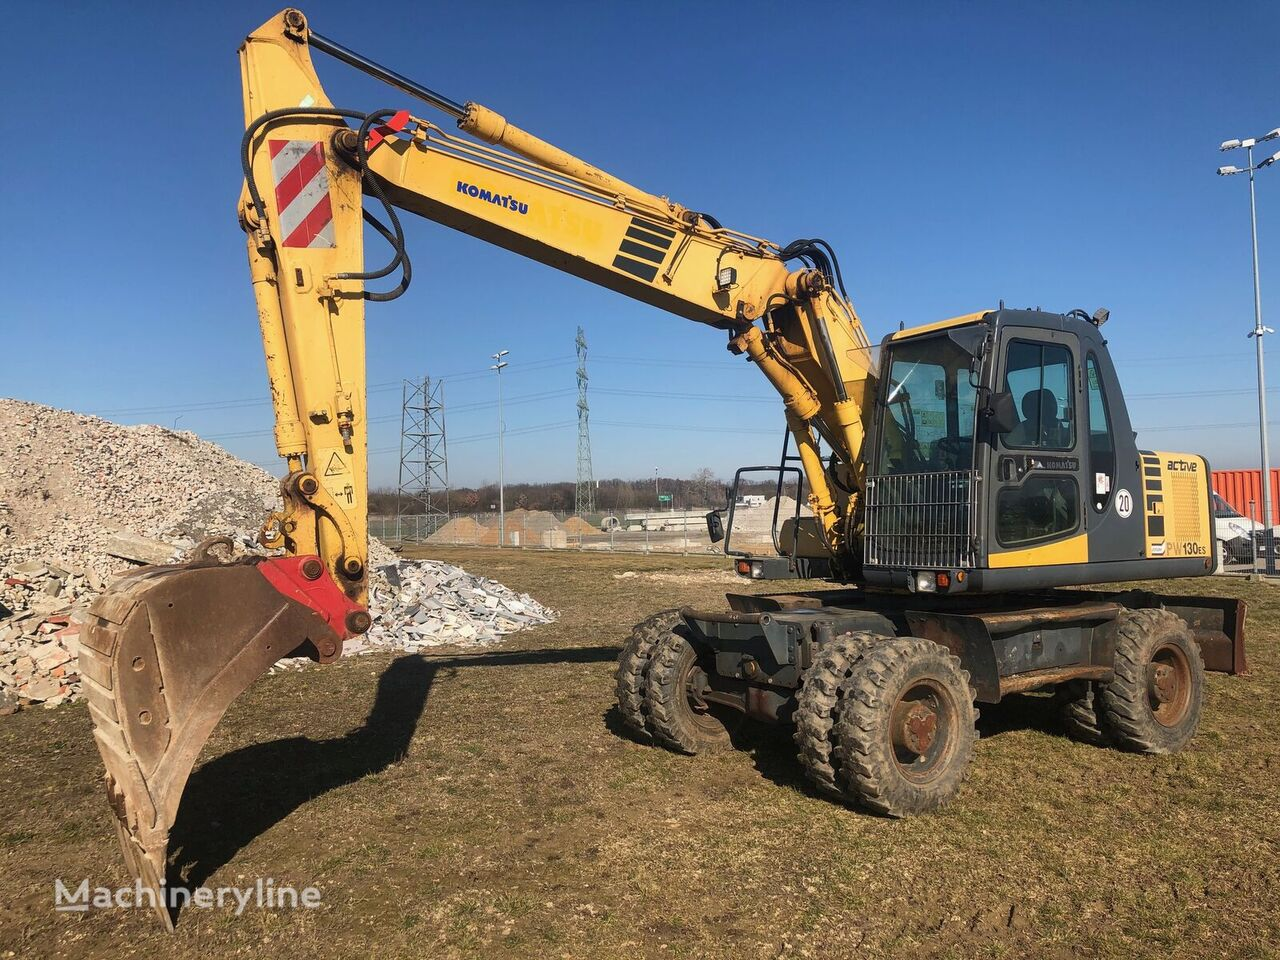 KOMATSU  PW 130 ES-6K wheel excavator